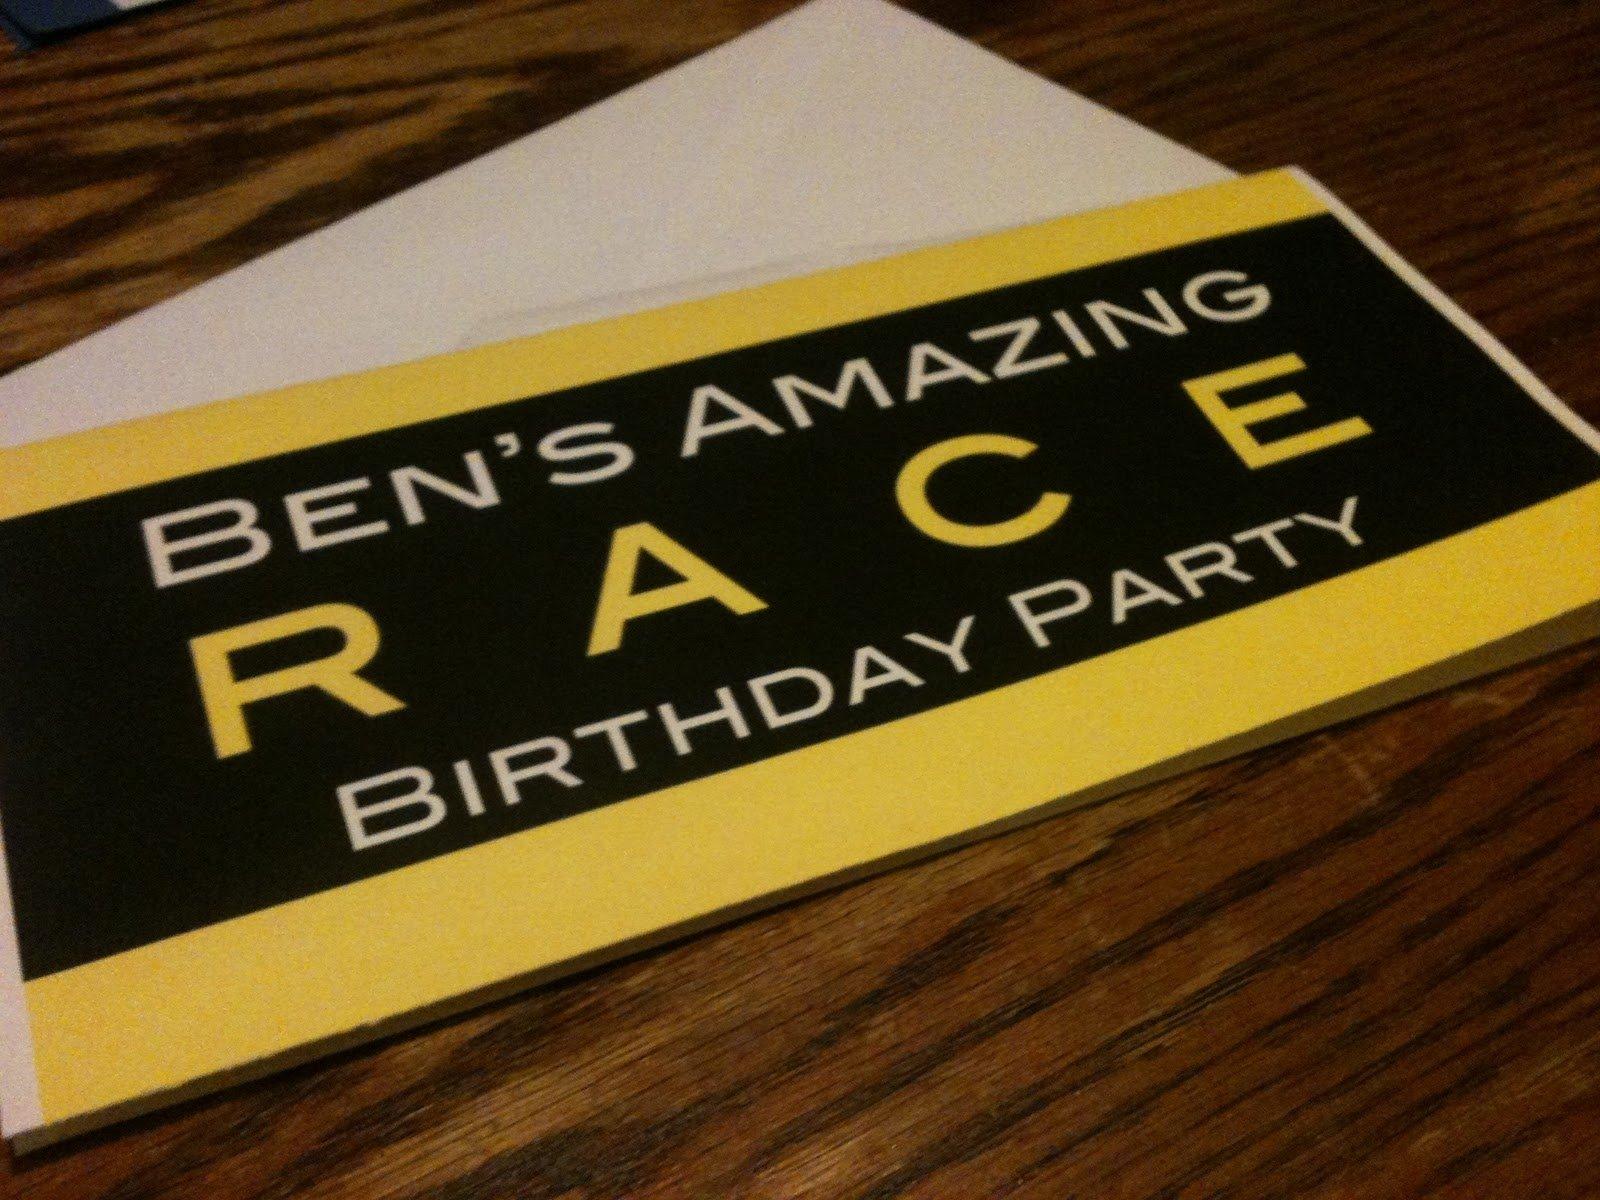 10 Wonderful Amazing Race Birthday Party Ideas bens amazing race birthday party homeschool musings 2020